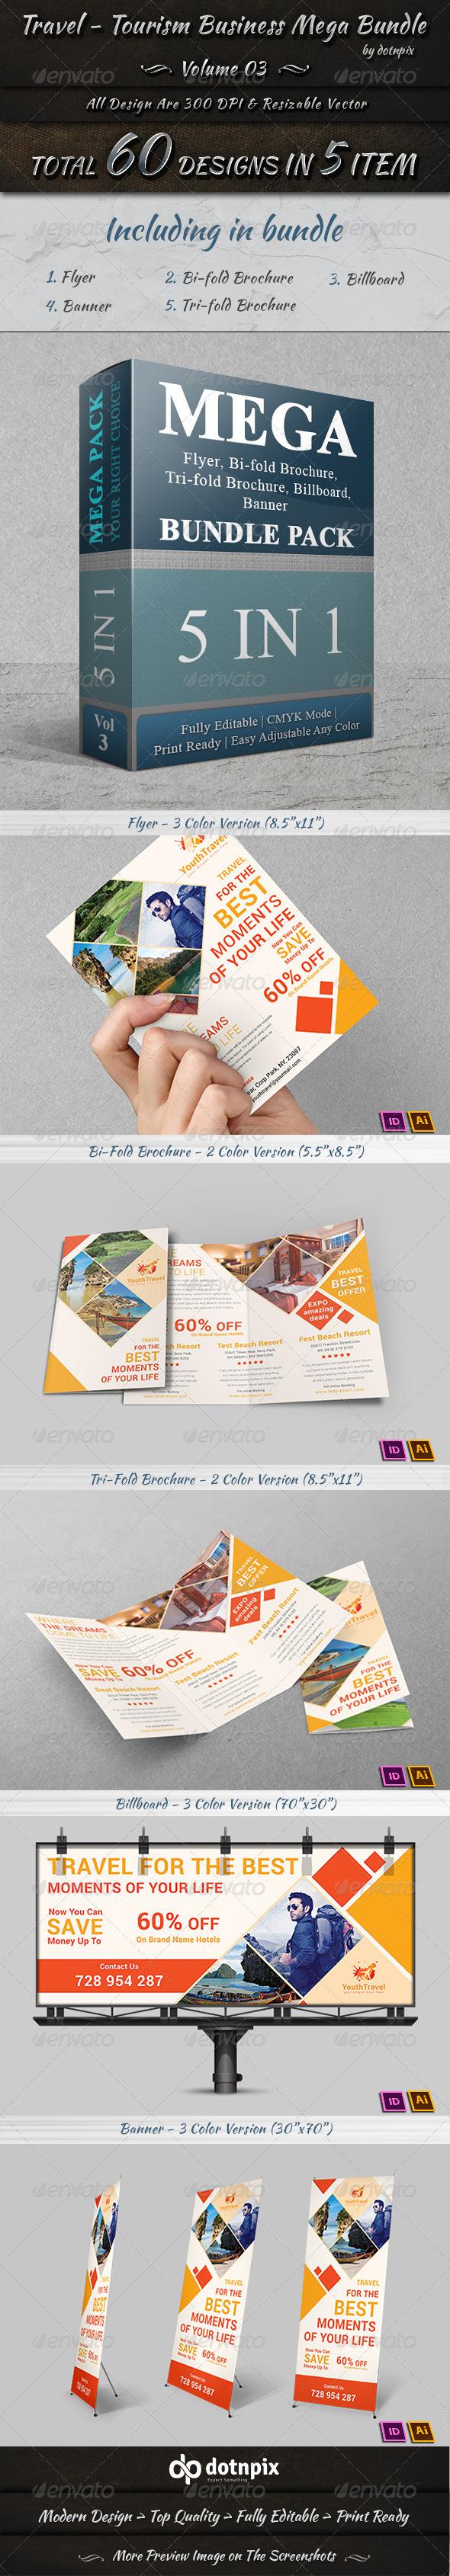 GraphicRiver Travel Tourism Business Mega Bundle Volume 3 7600387